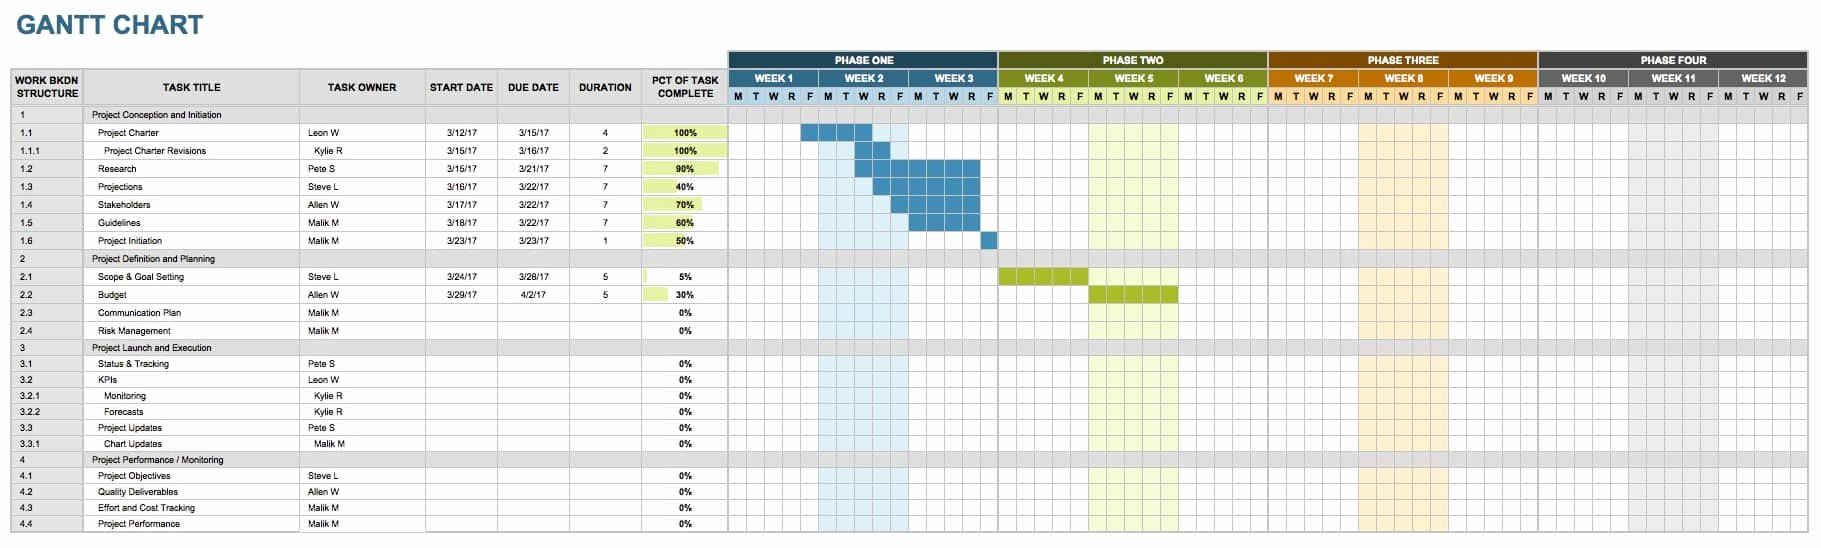 Marketing Timeline Template Excel Fresh Free Marketing Timeline Tips and Templates Smartsheet